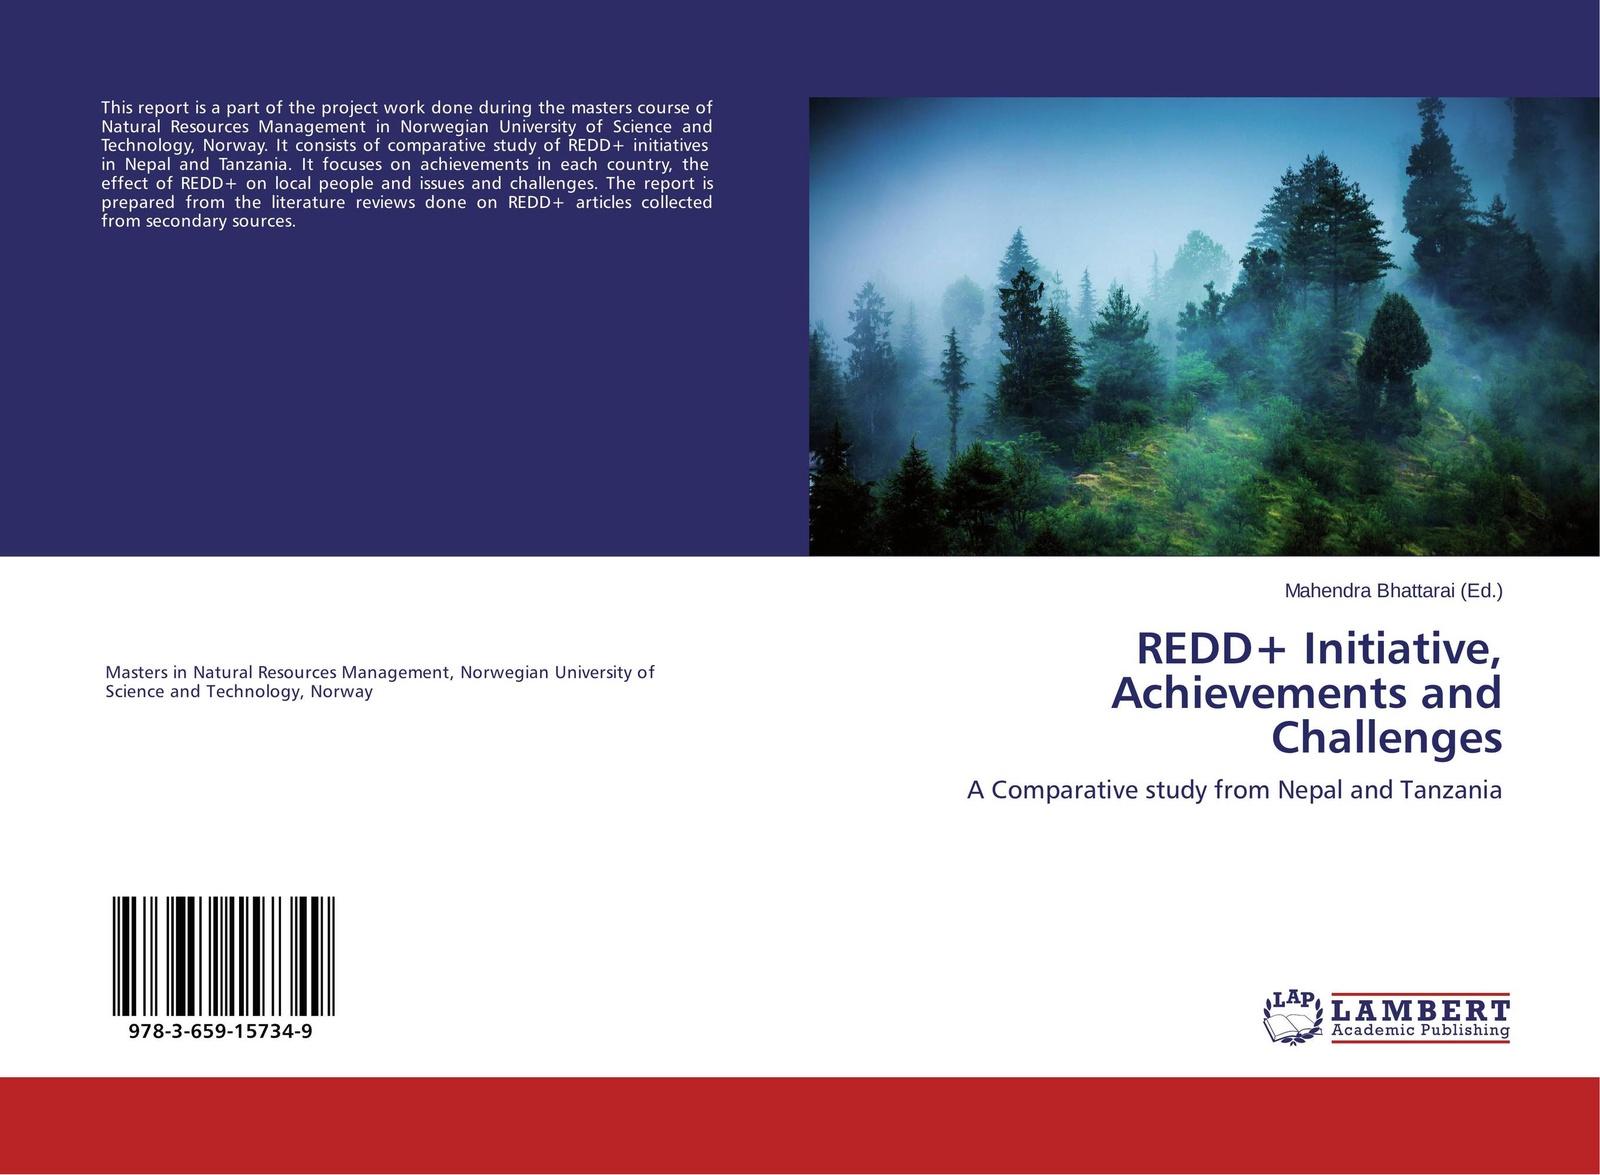 Mahendra Bhattarai REDD+ Initiative, Achievements and Challenges joel kayombo education for all in tanzania achievements and shortfalls